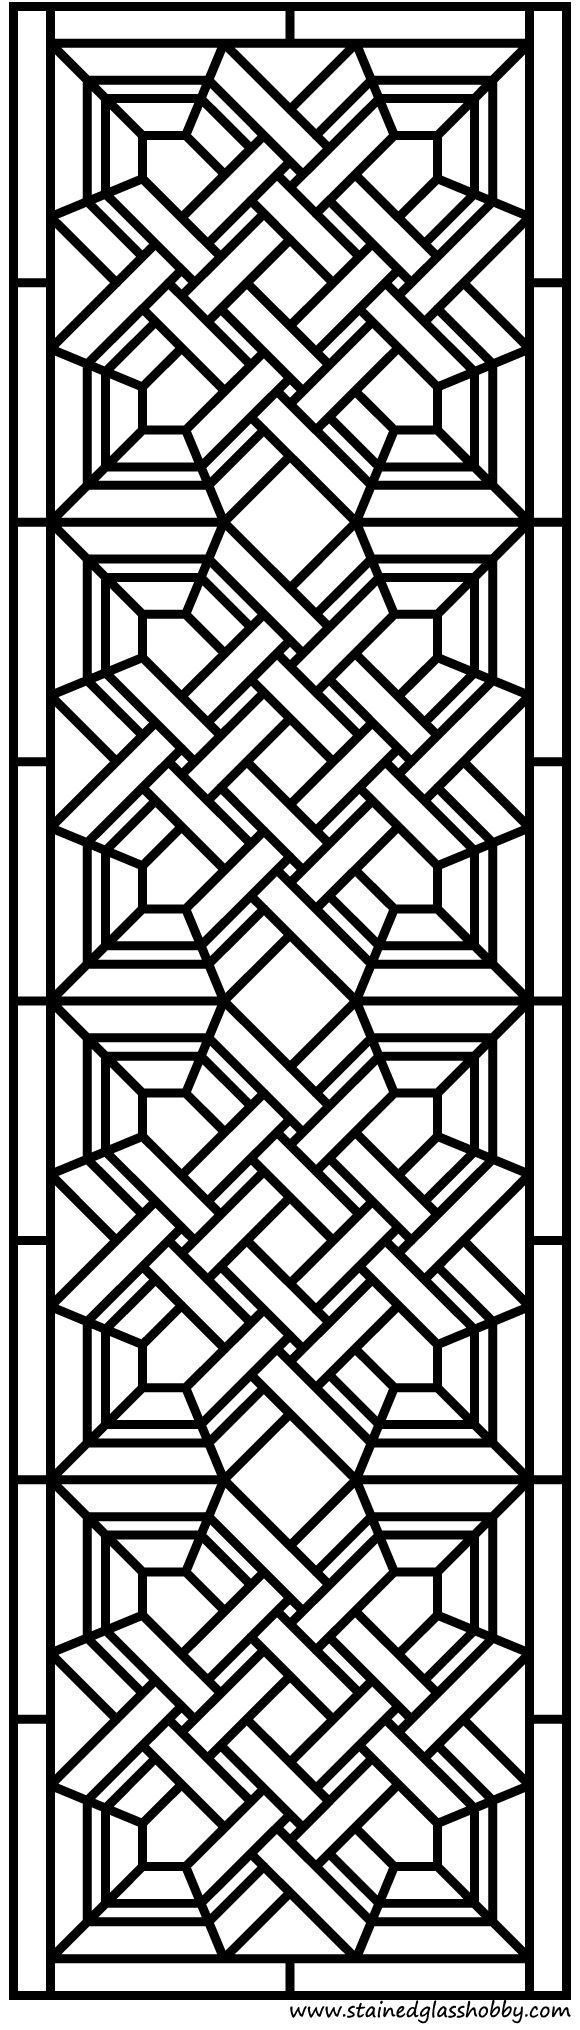 Design do painel de porta de vidro manchado | mandala | Pinterest ...